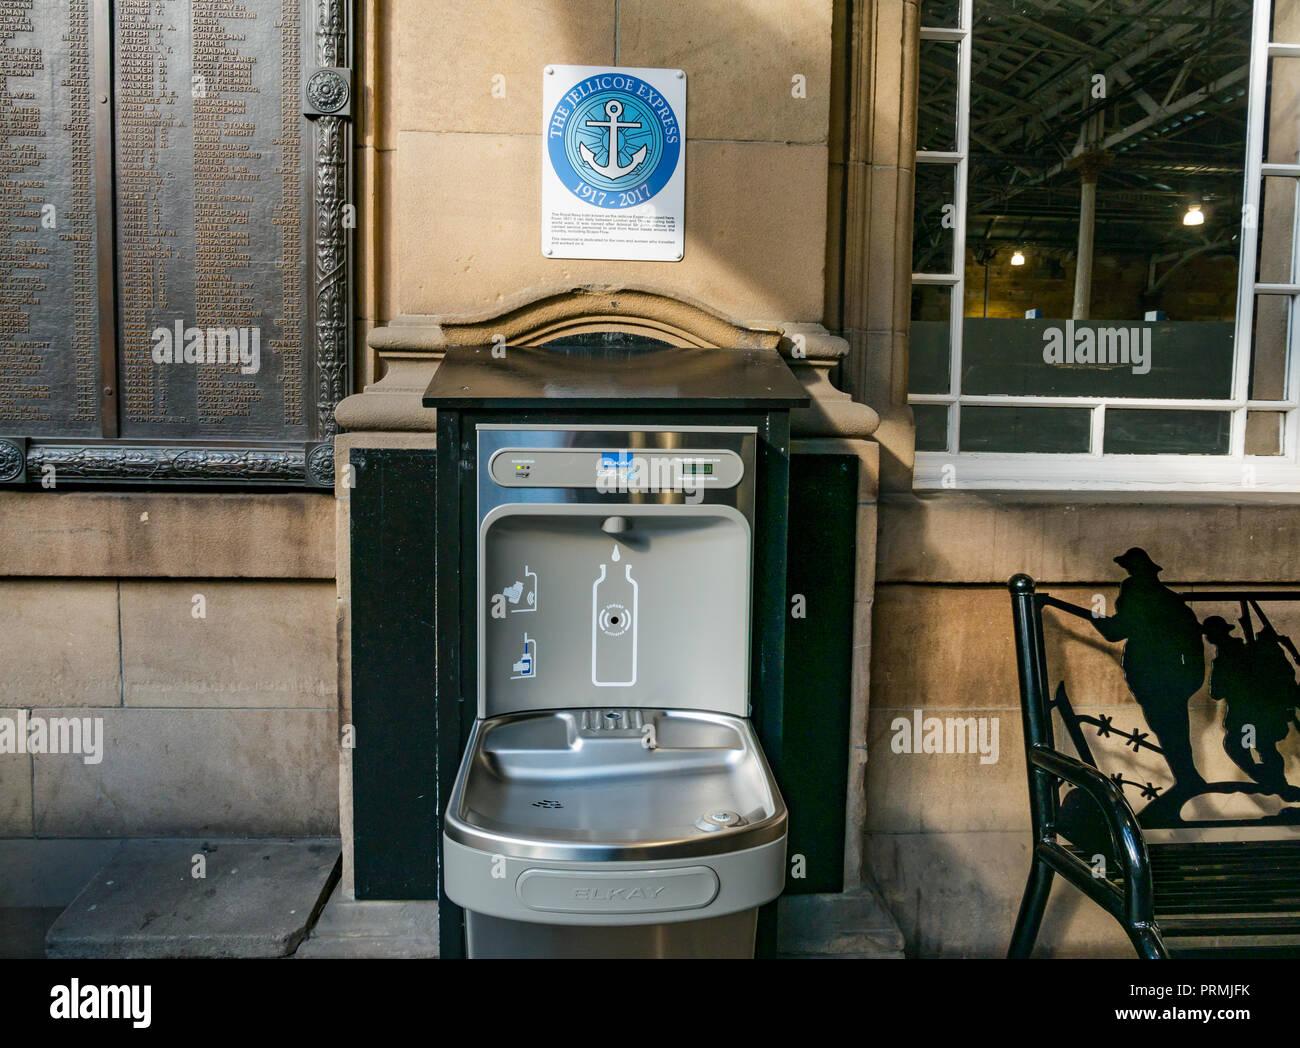 New environmentally friendly top up reusable bottle refill tap to encourage plastic waste reduction, Waverley Railway Station, Edinburgh, Scotland, UK - Stock Image